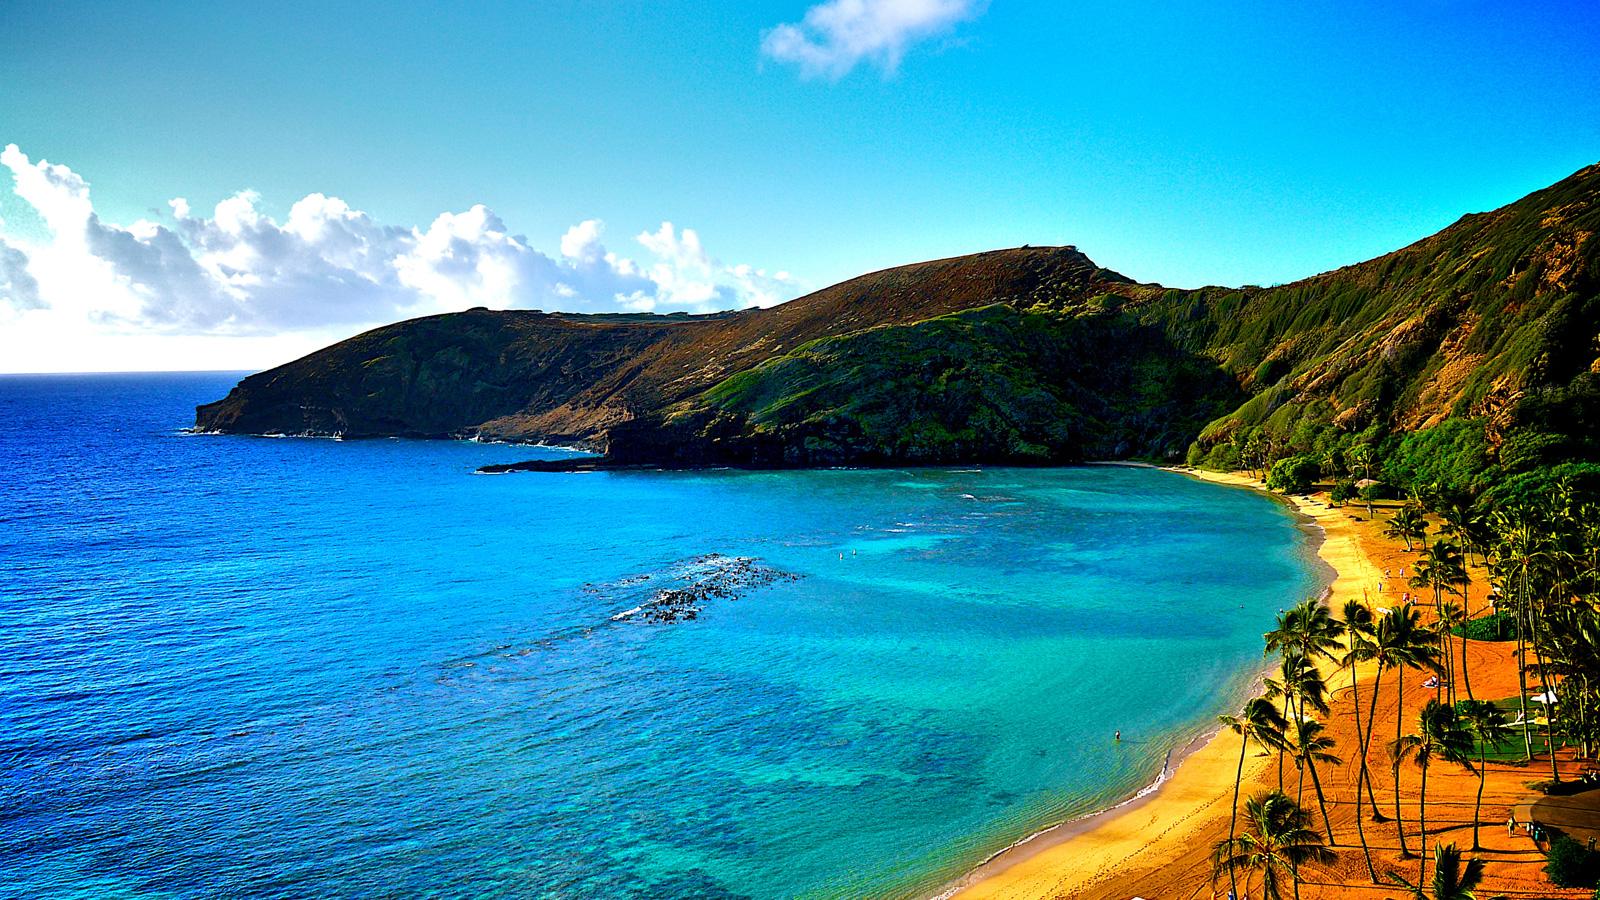 Hawaii Wallpaper Download 9